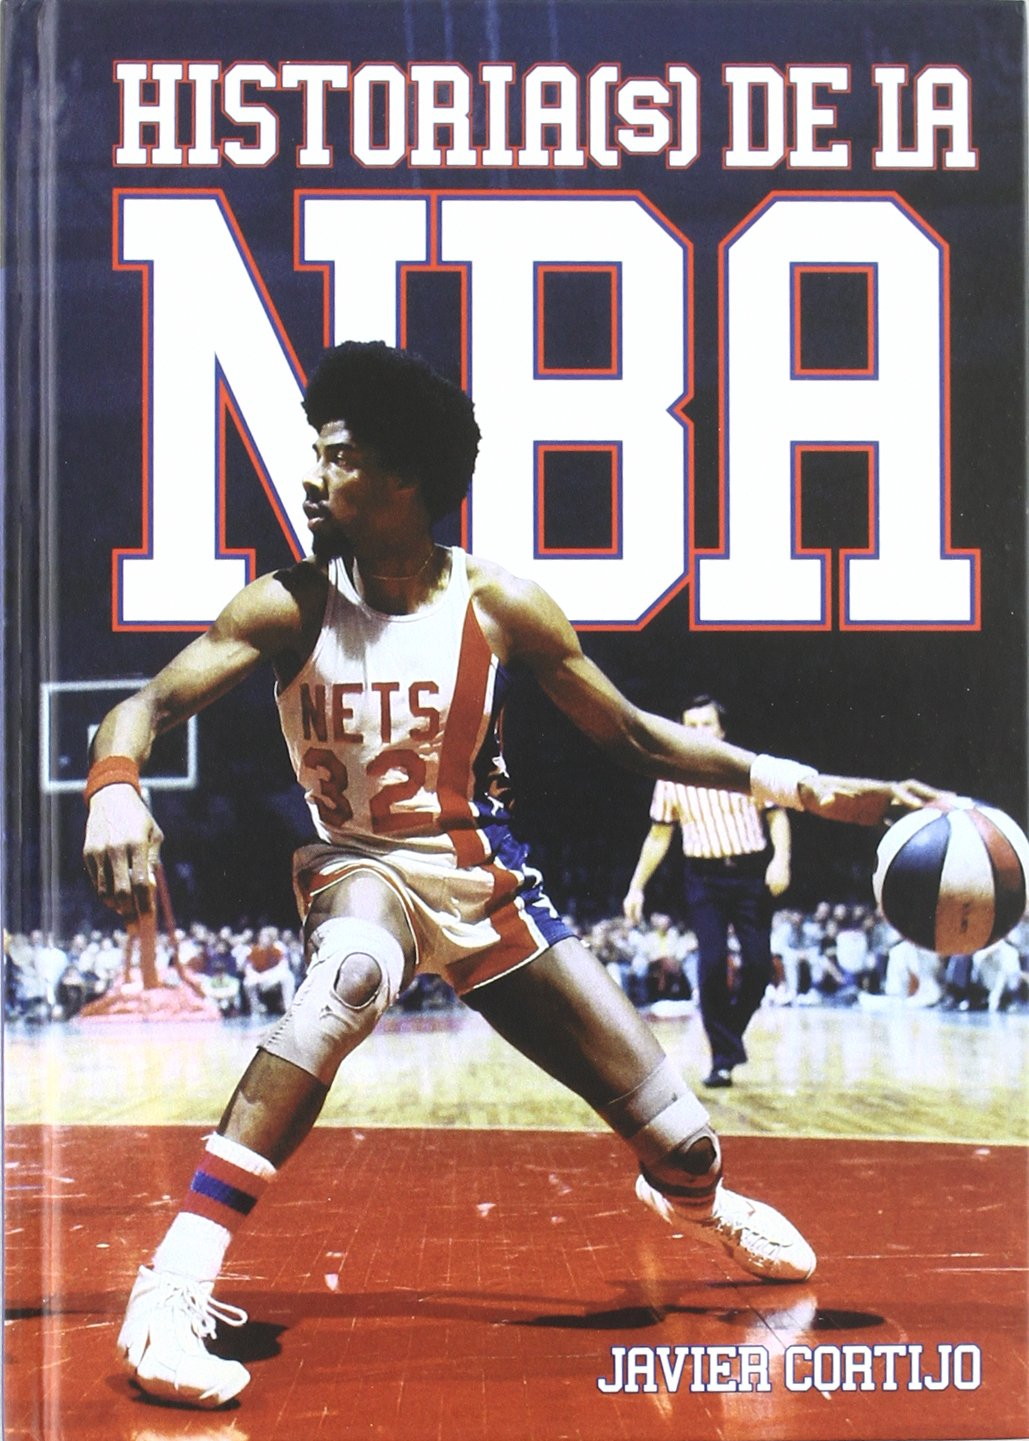 Historia(s) de la NBA Tapa dura – 15 dic 2011 Javier Cortijo Bernardos Bookland Press Editores 8493848441 Baloncesto